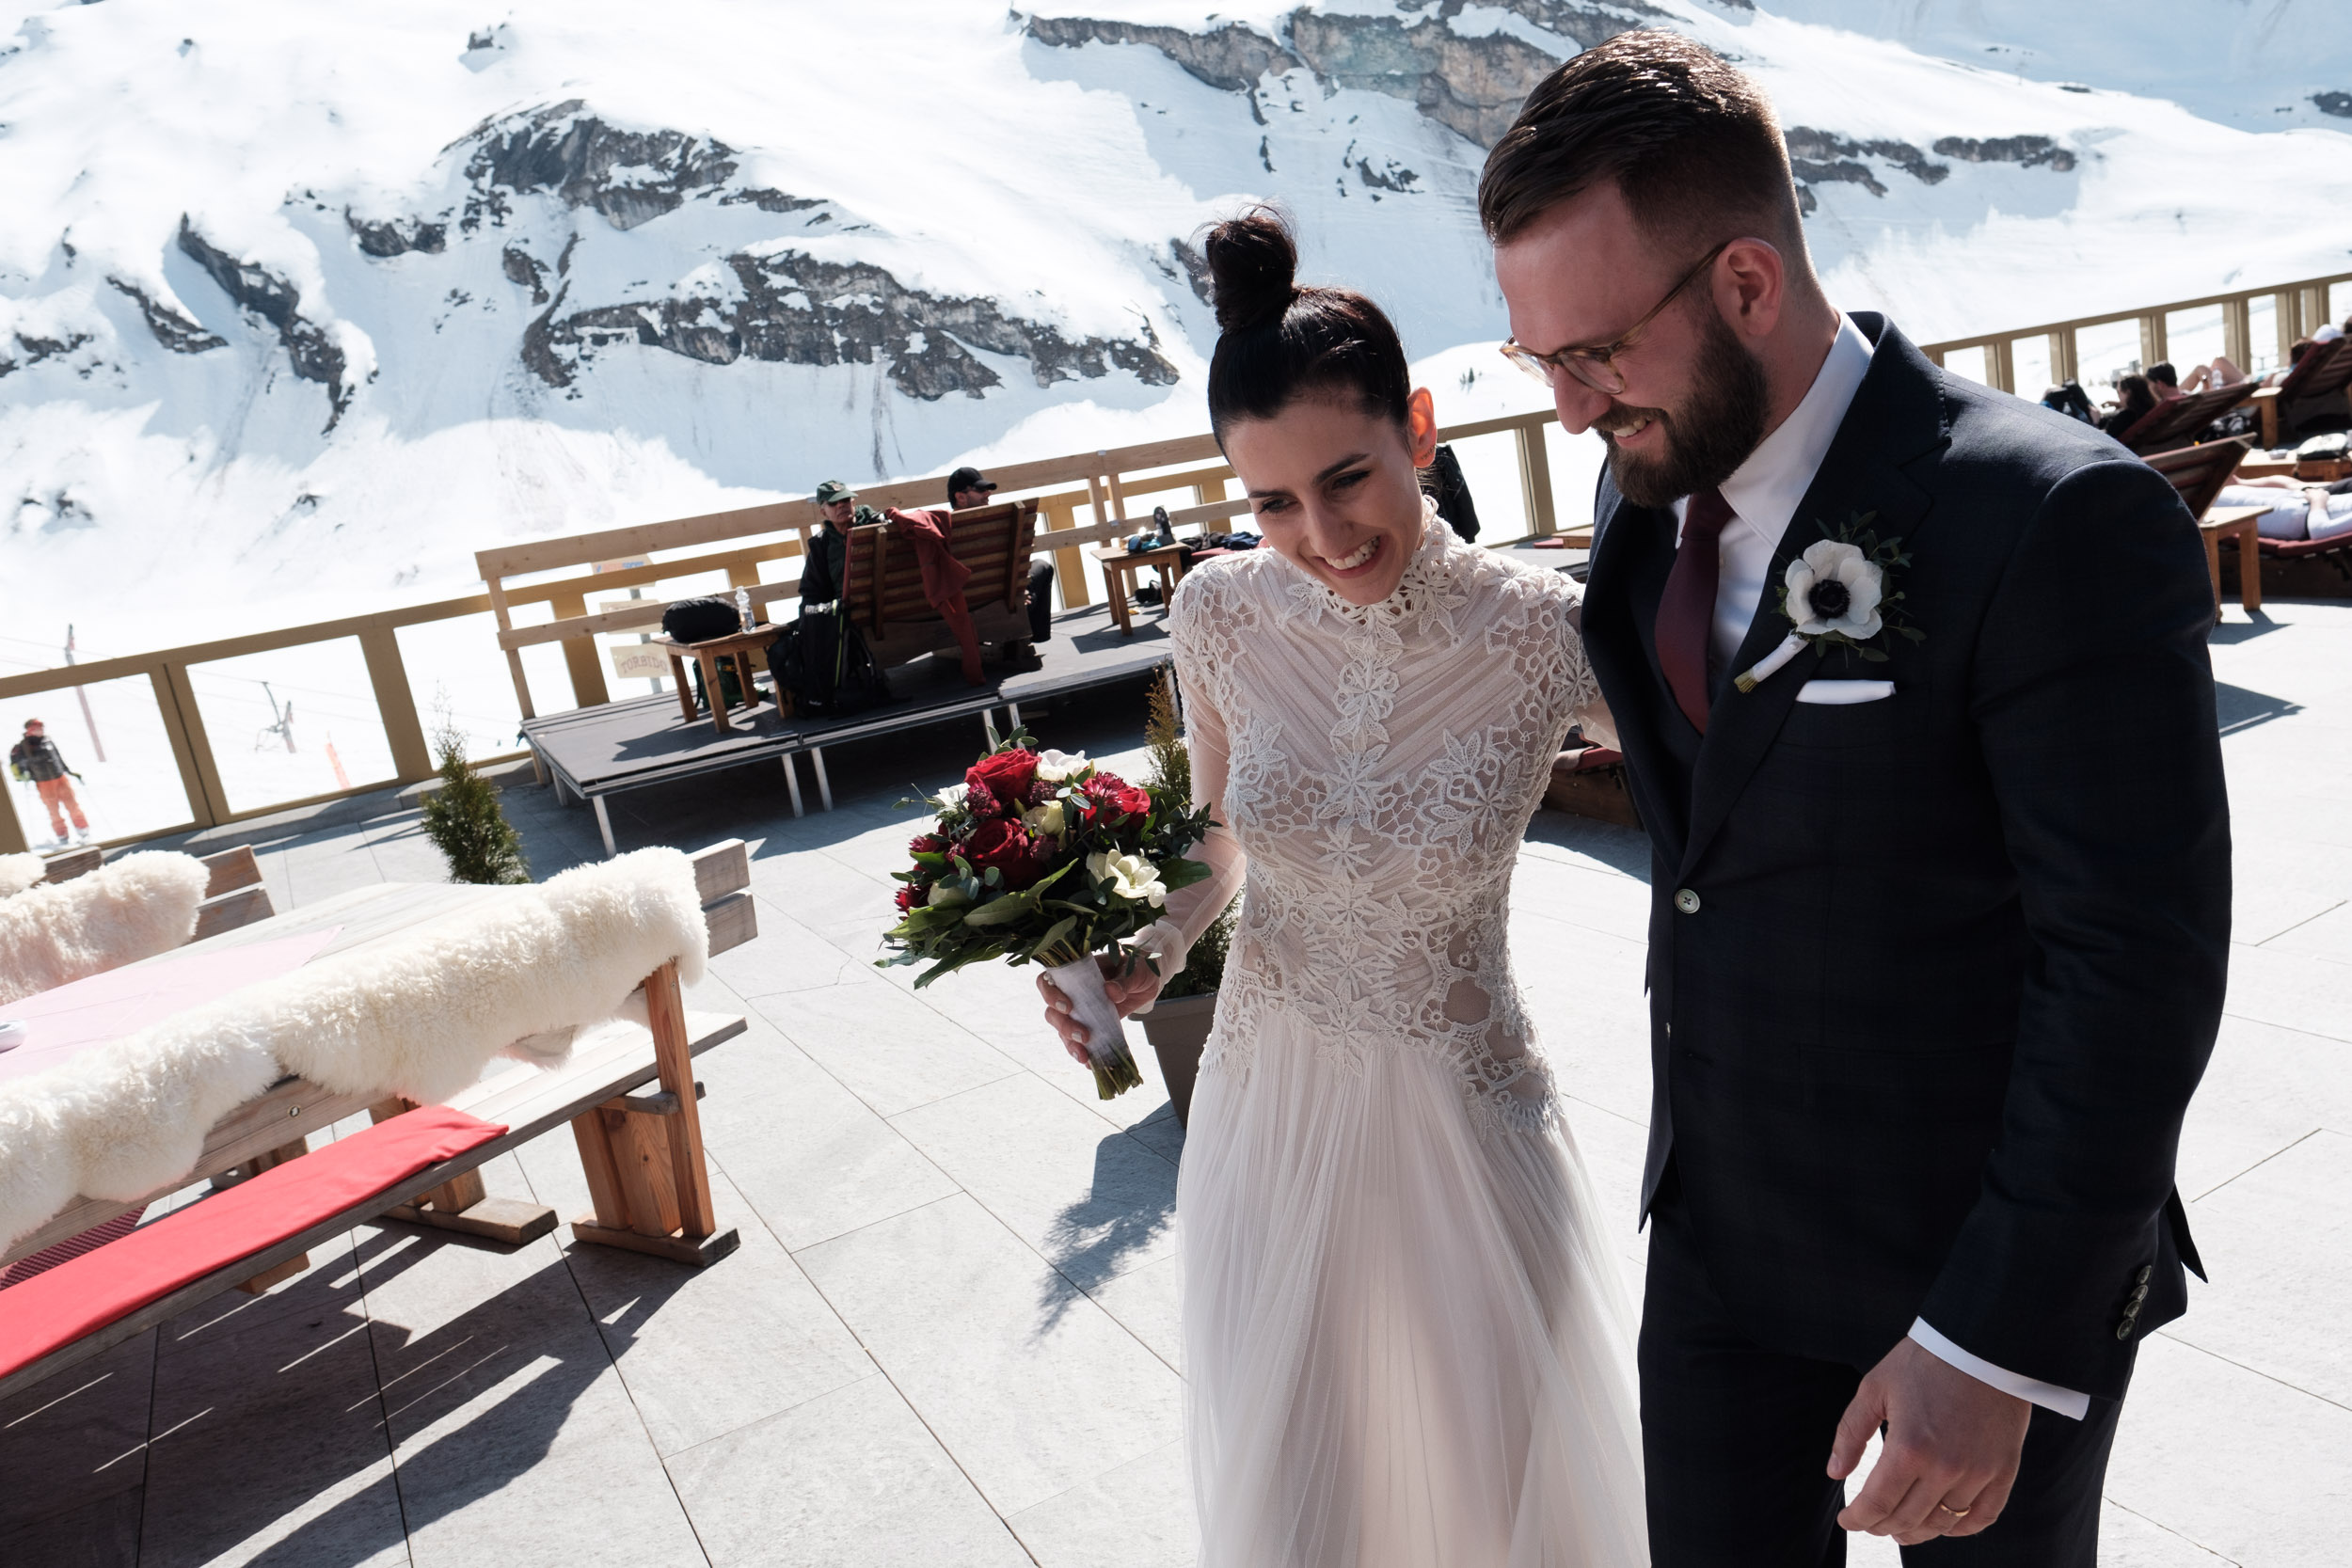 lynn-bastian-switzerland-wedding-photography-69.jpg